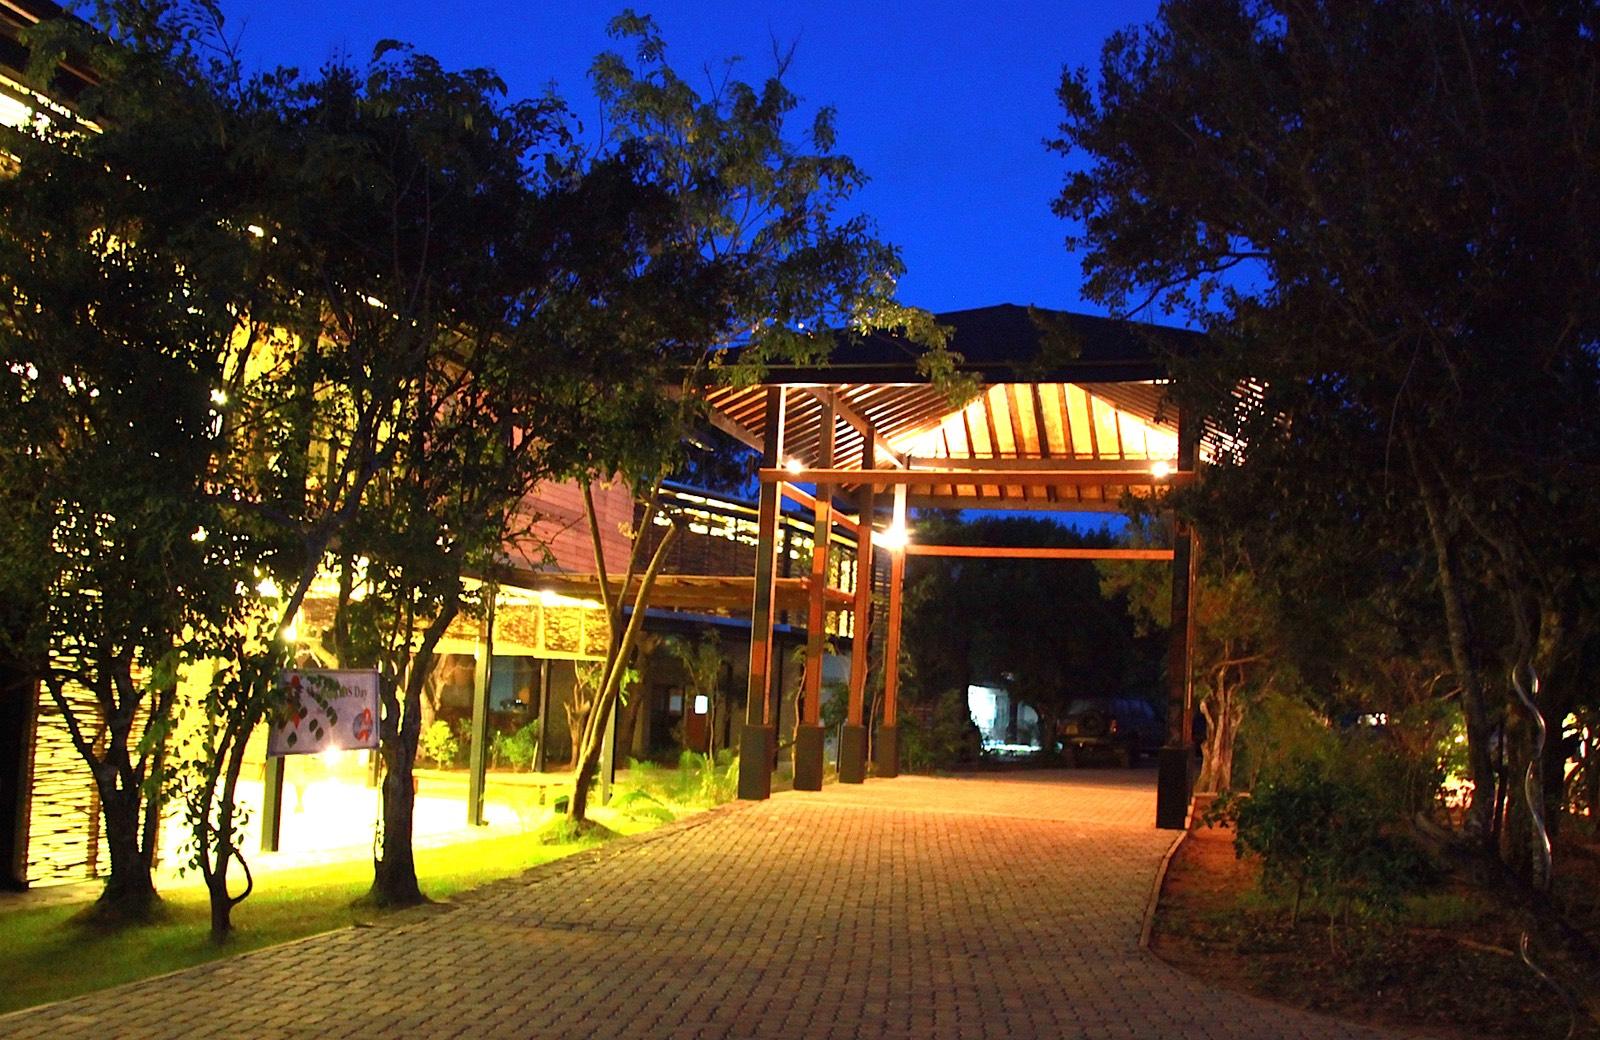 invite-to-paradise-holiday-honeymoon-sri-lanka-specialists-safari-lodge-cinnamon-wild-hotel-4.jpg